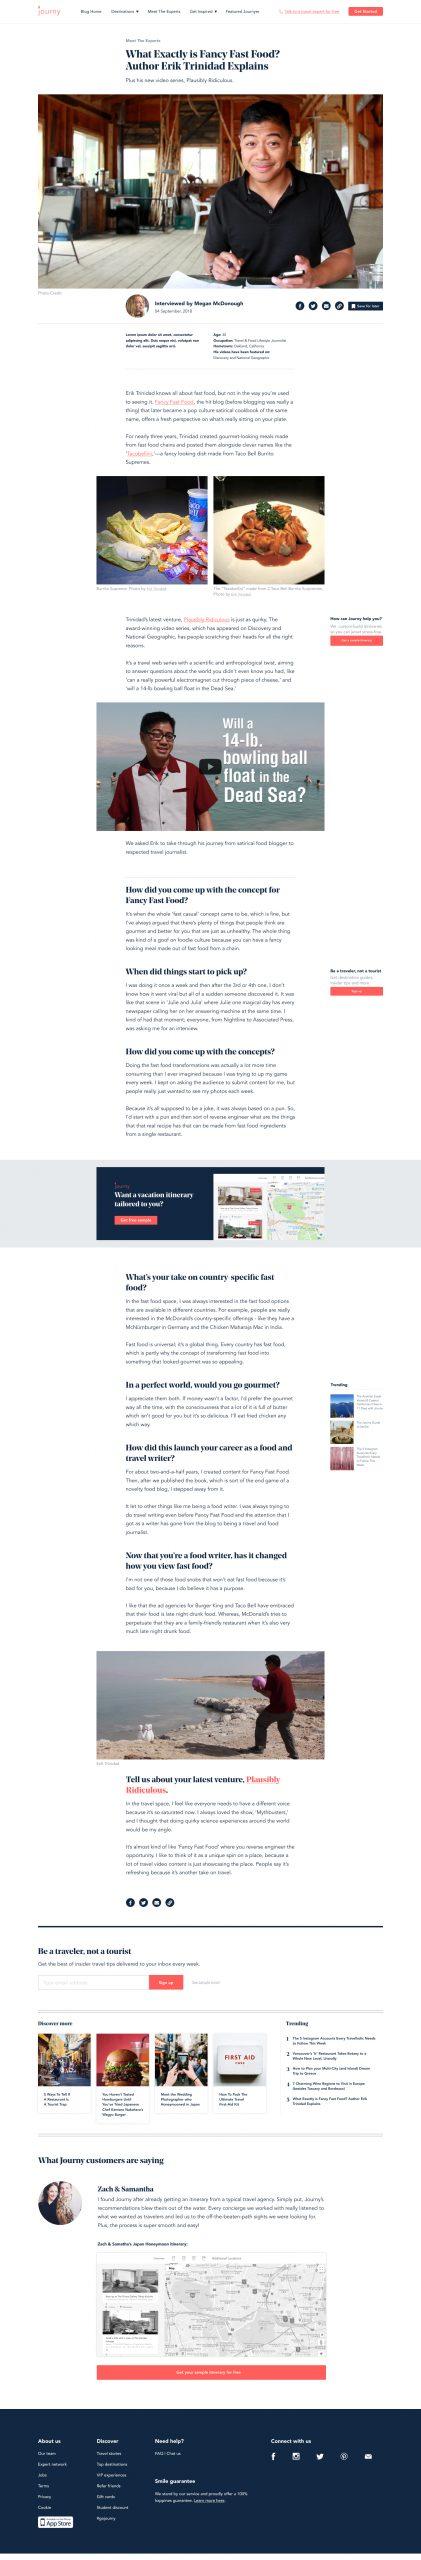 Journy-Content-Hub-Meet-The-Experts